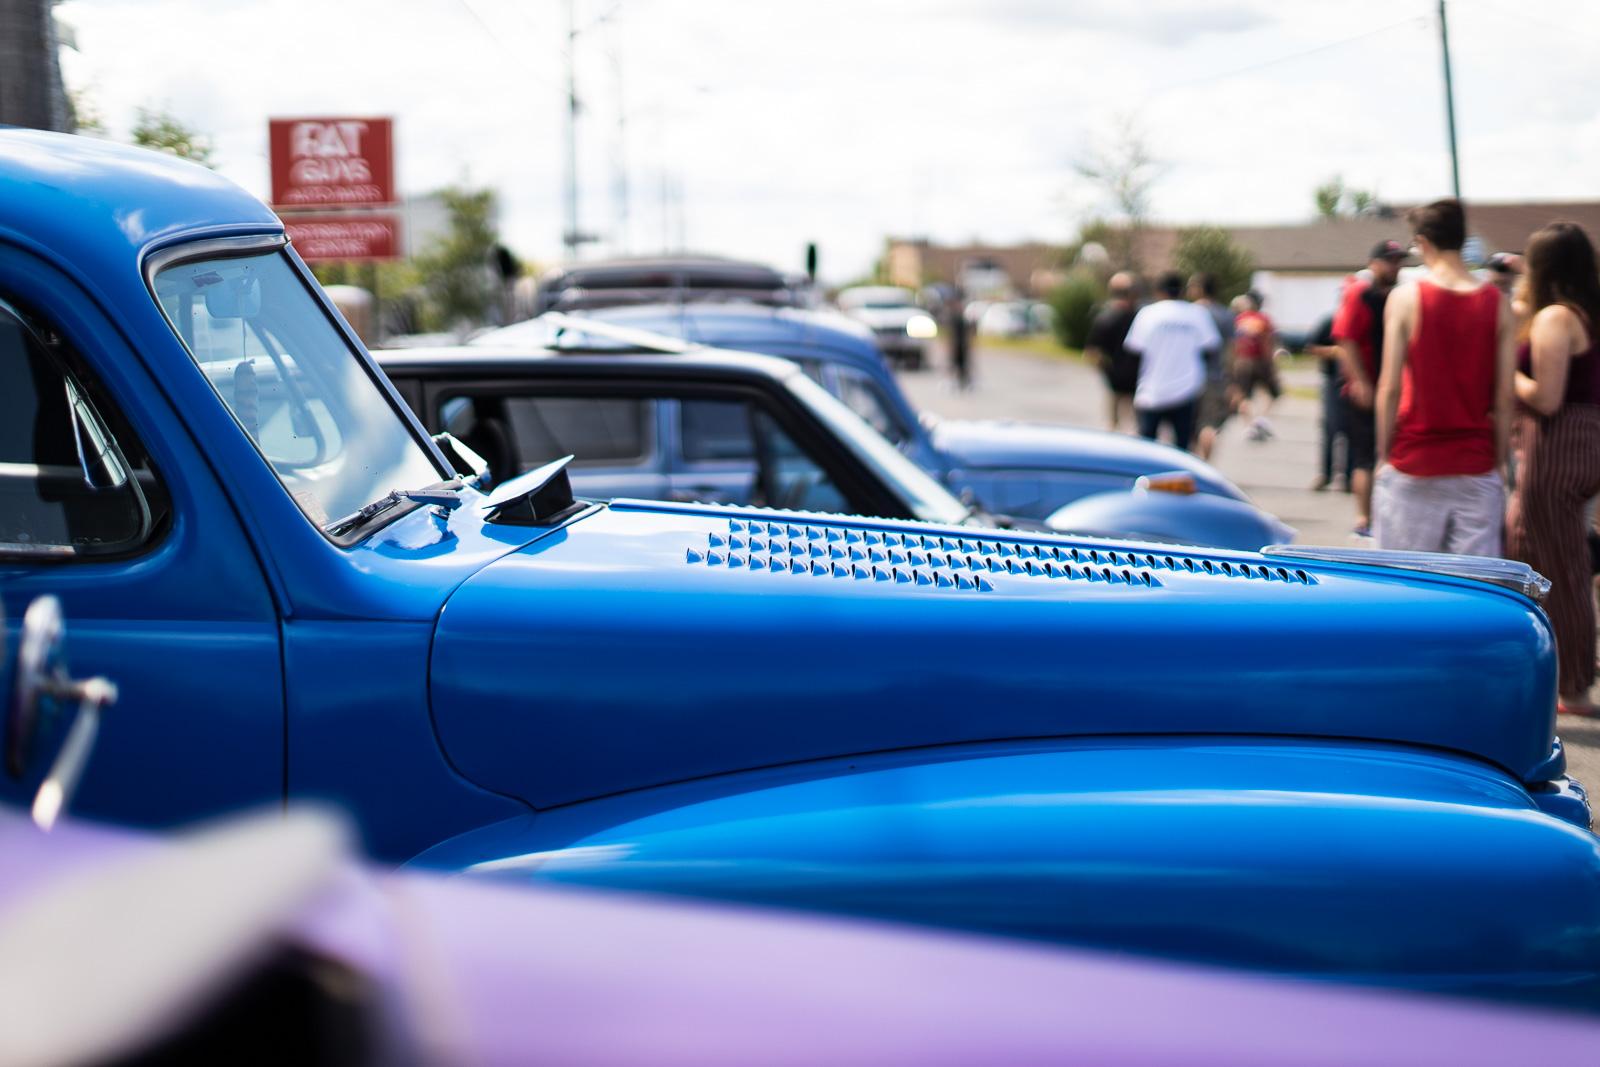 fat-guys-car-show-blog-64.jpg